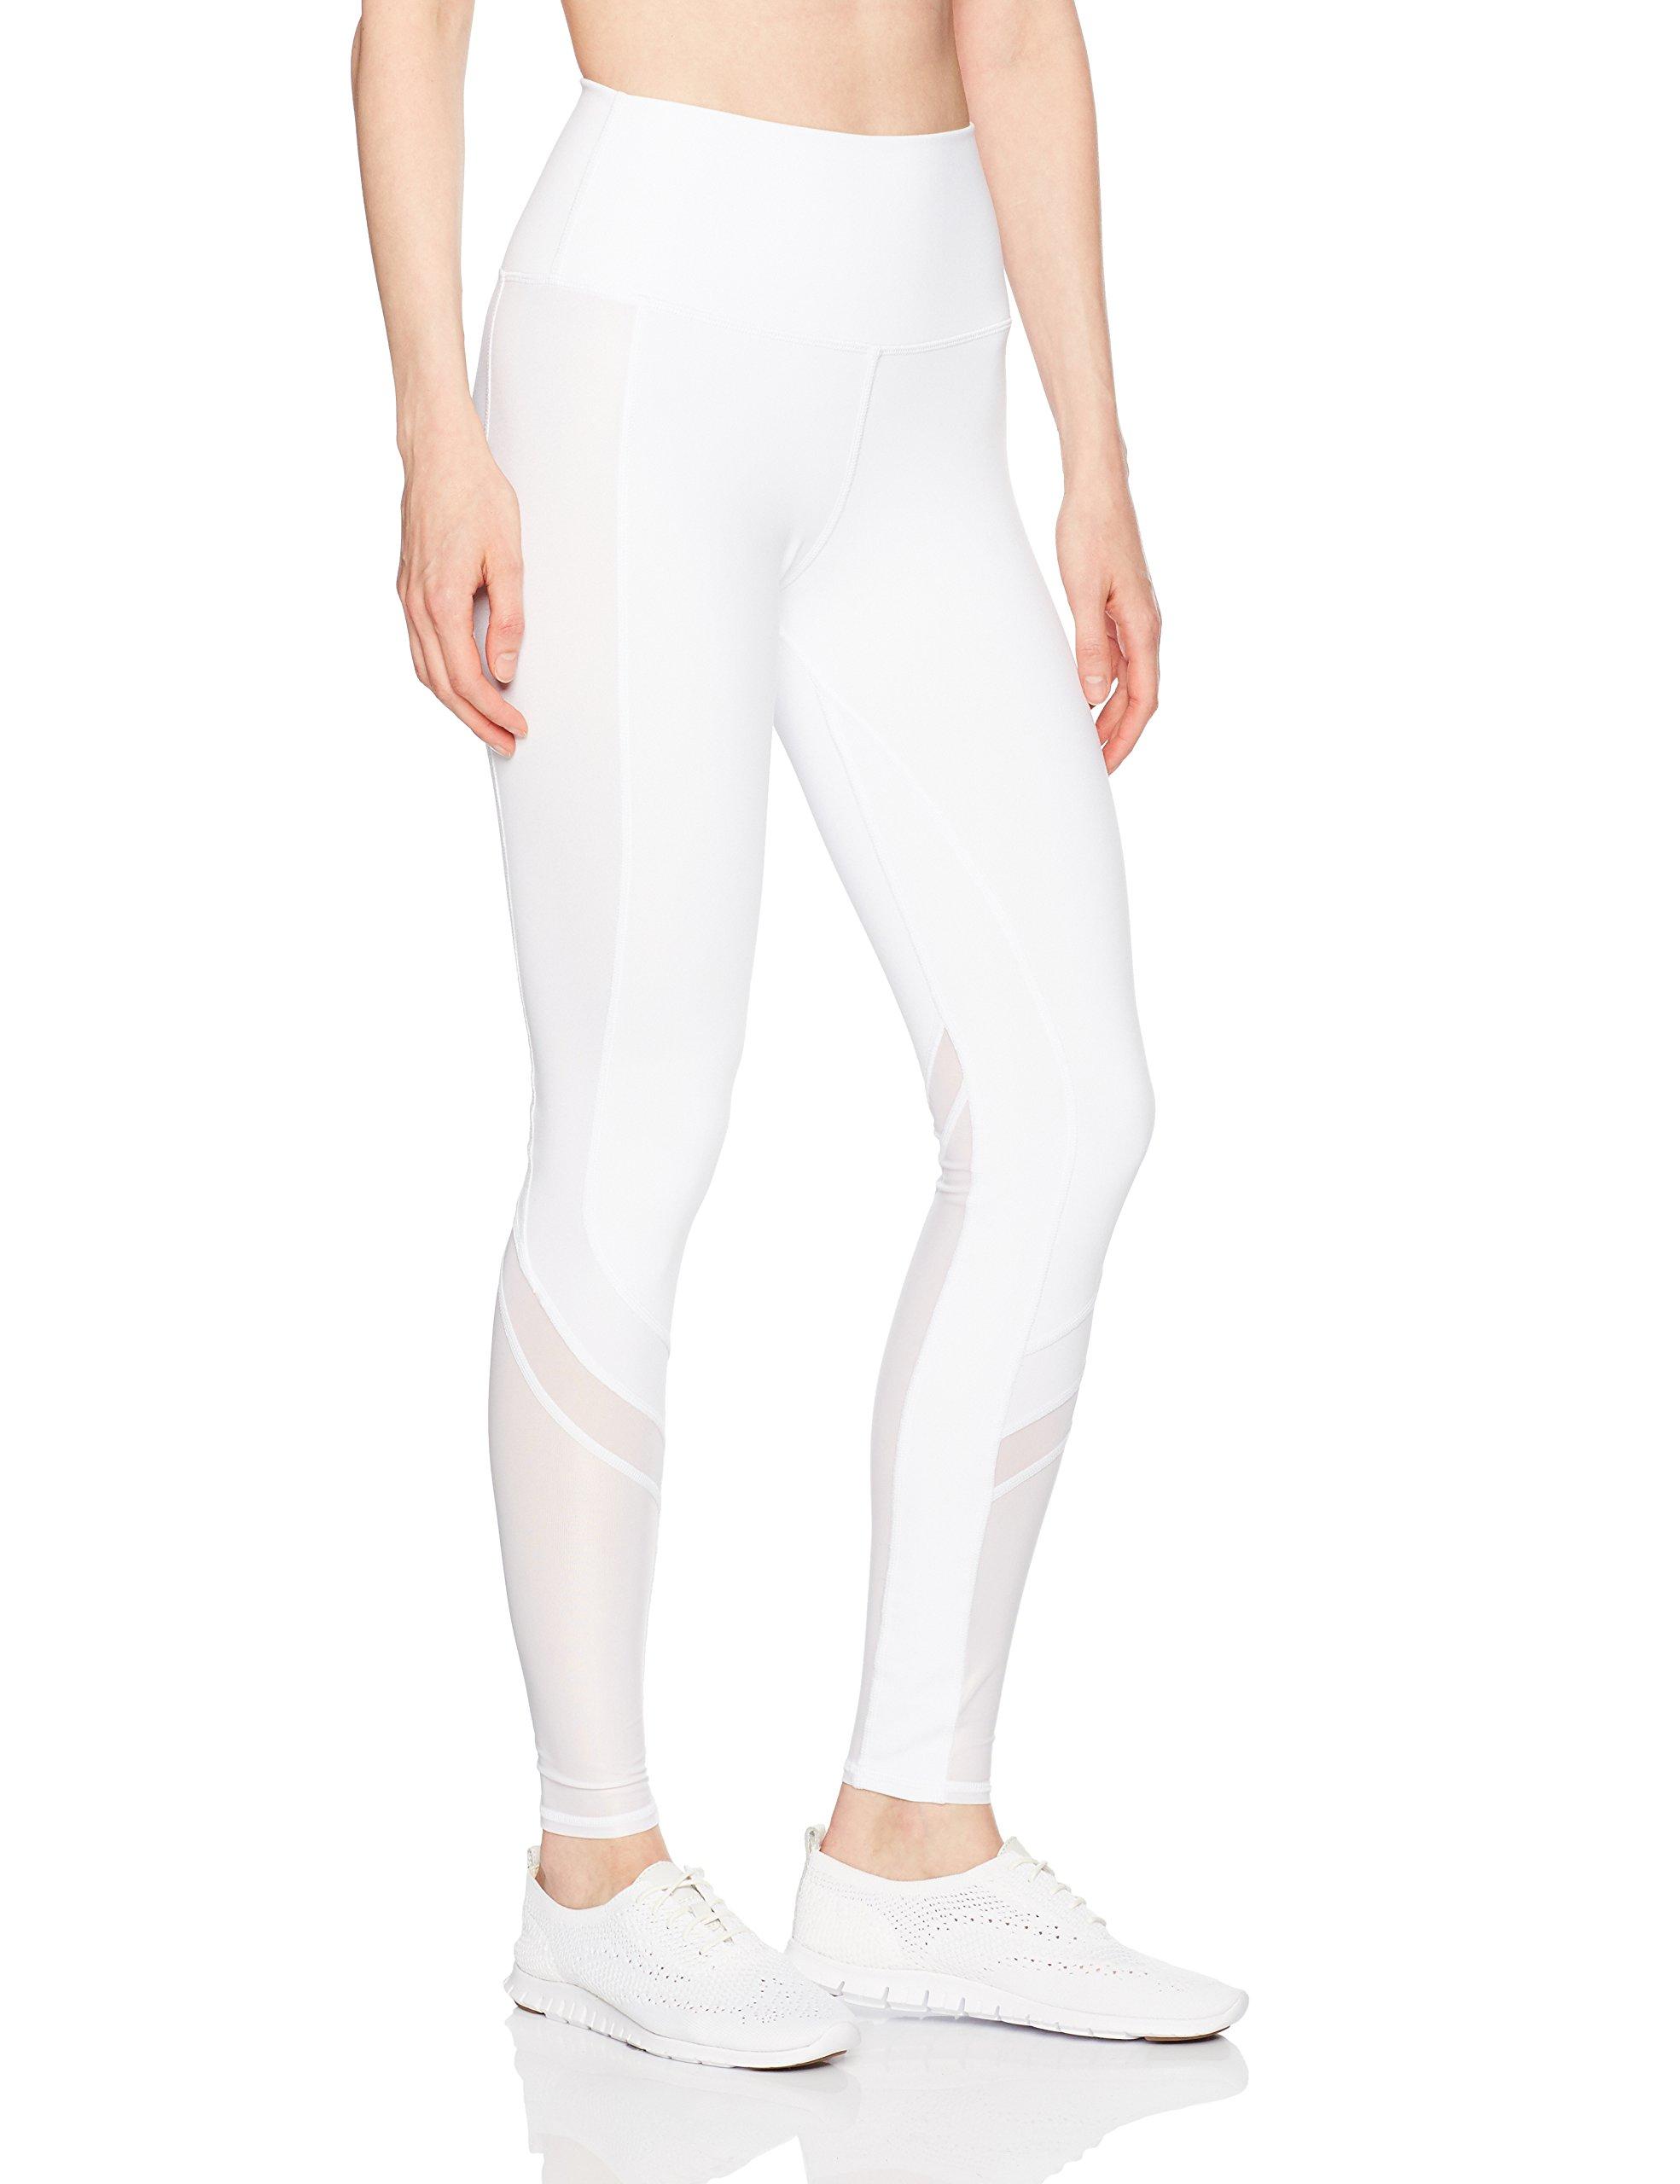 Alo Yoga Women's Elevate Legging, White, S